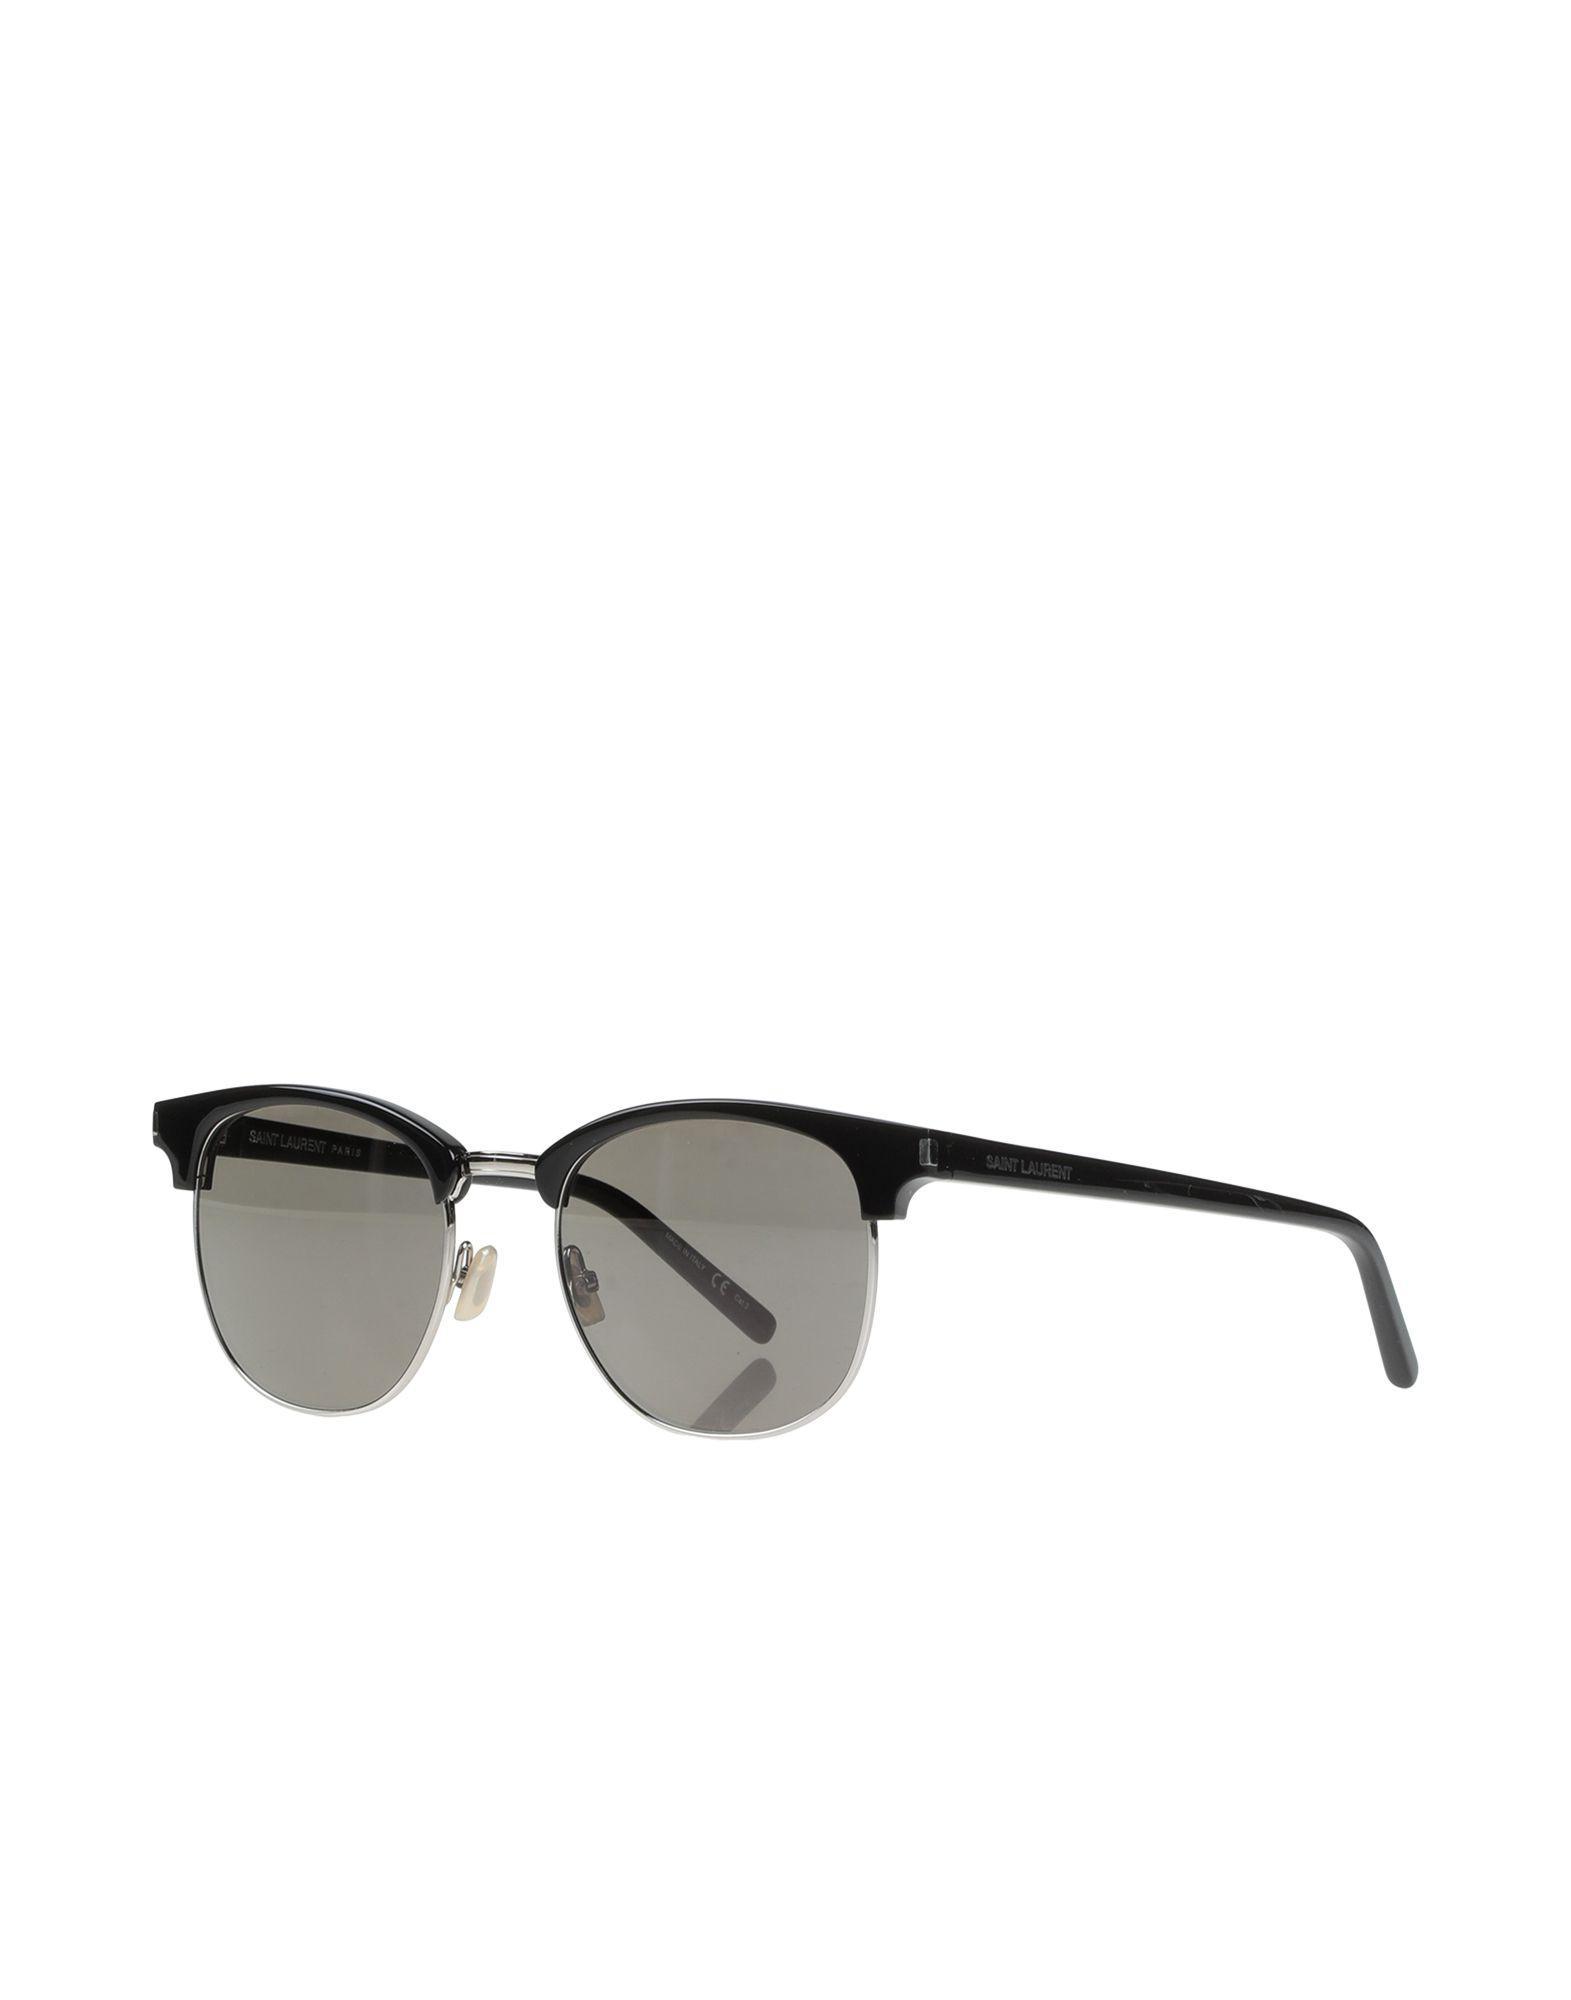 e42f5af05ae Saint Laurent - Black Sunglasses for Men - Lyst. View fullscreen